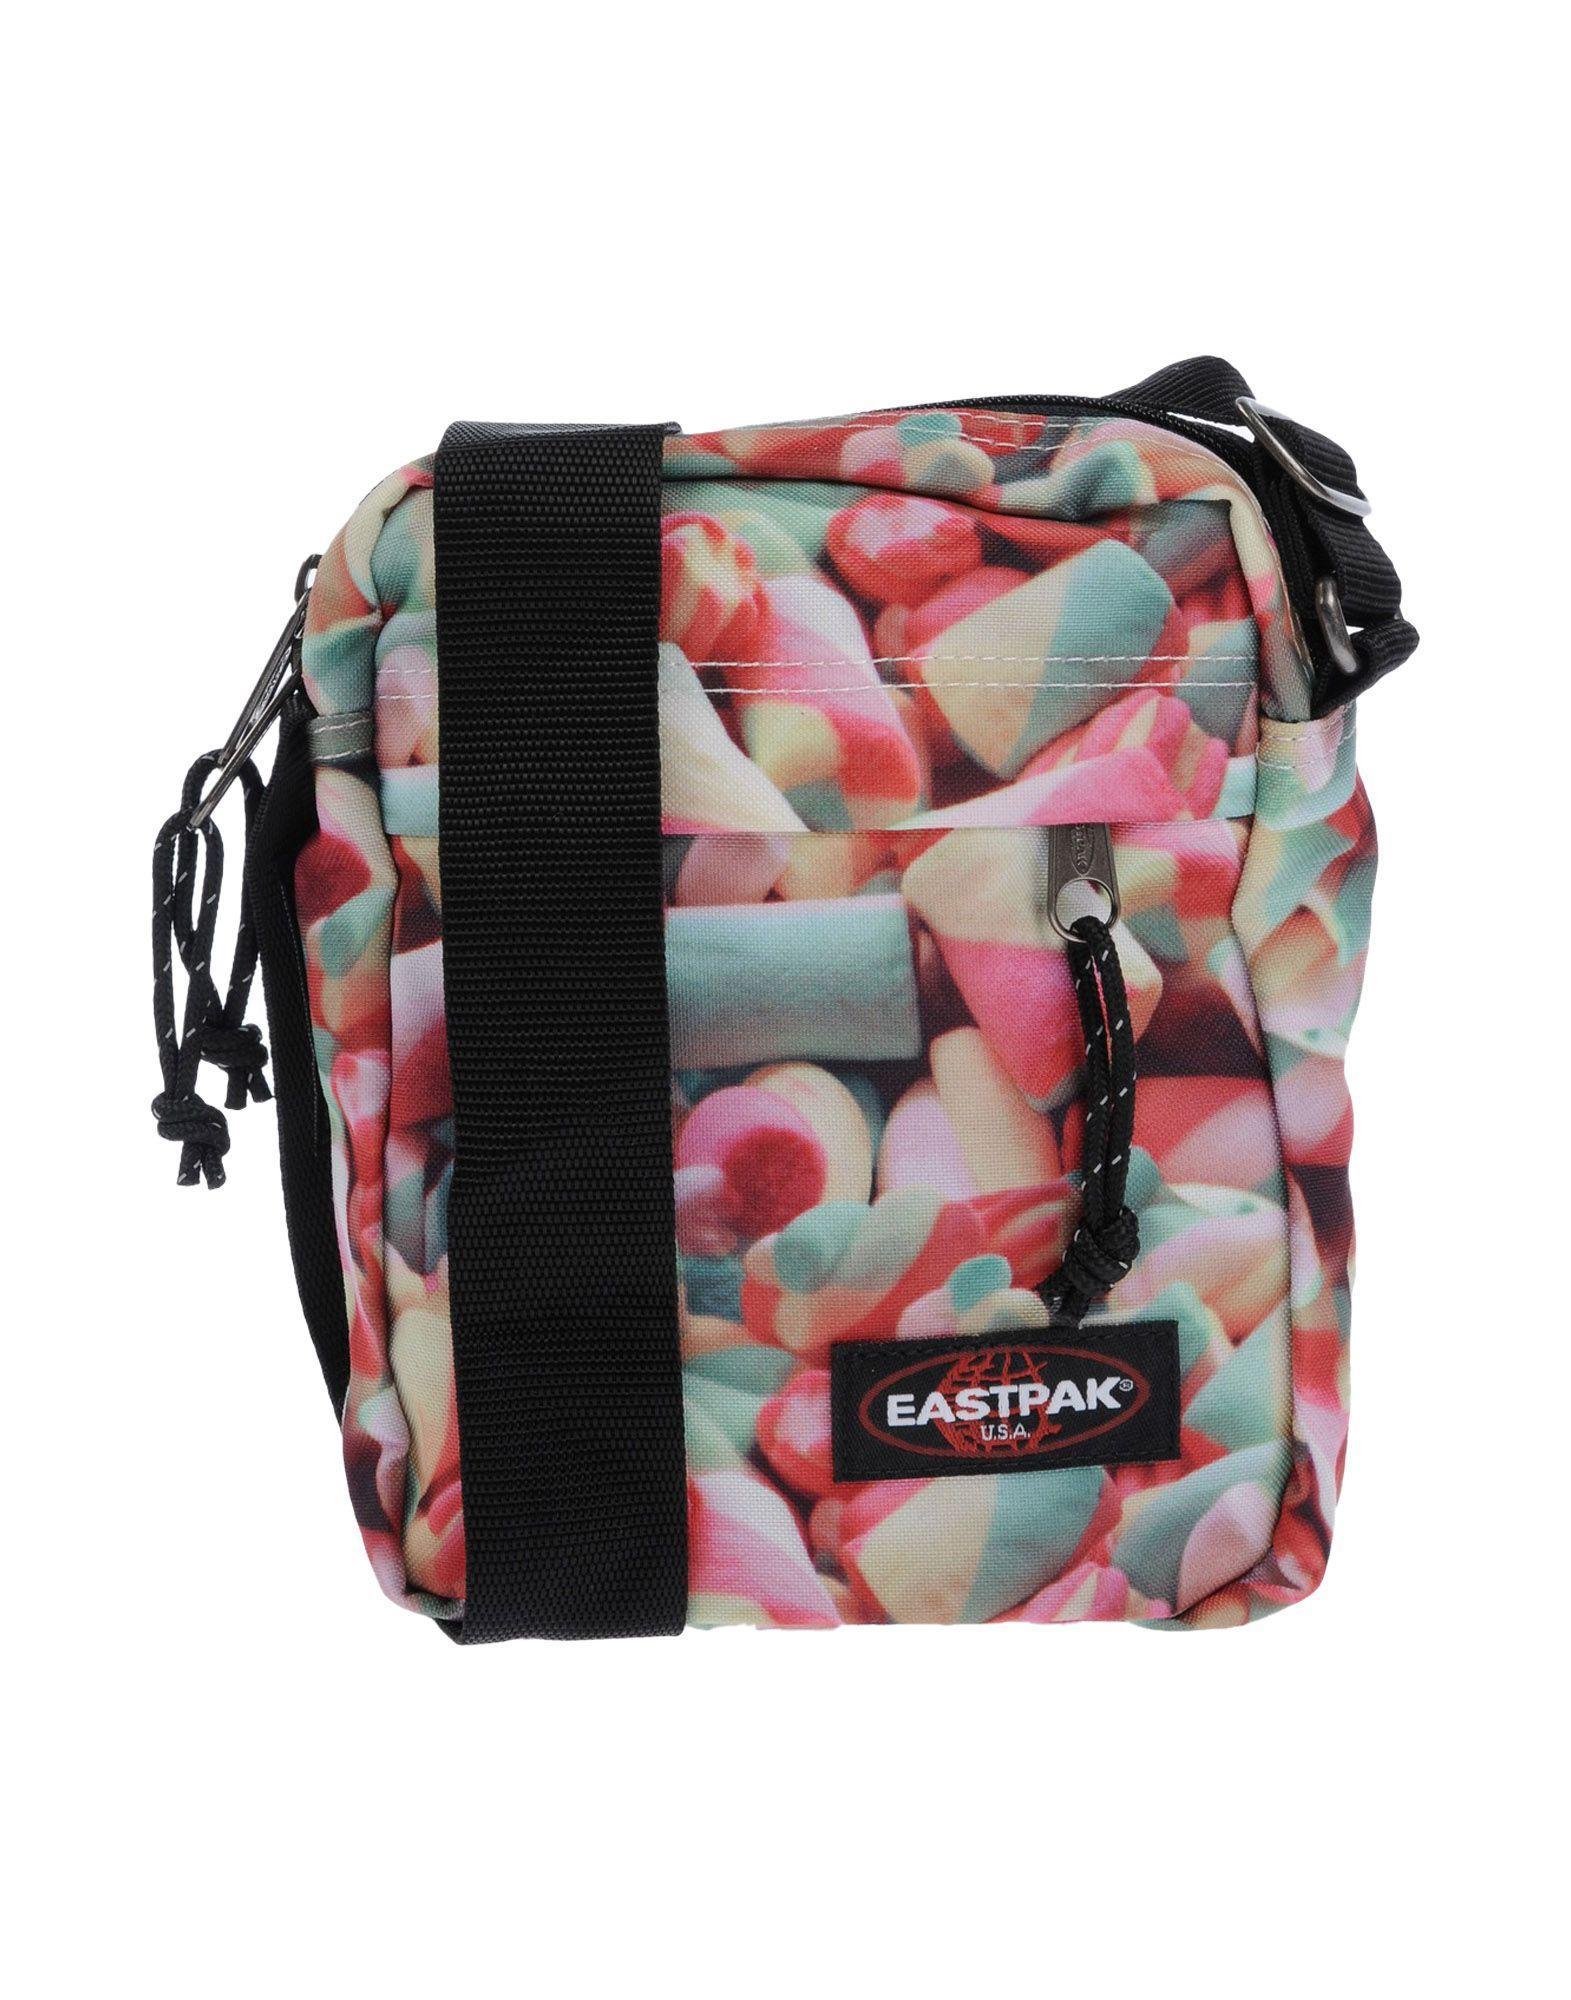 Eastpak In Pink